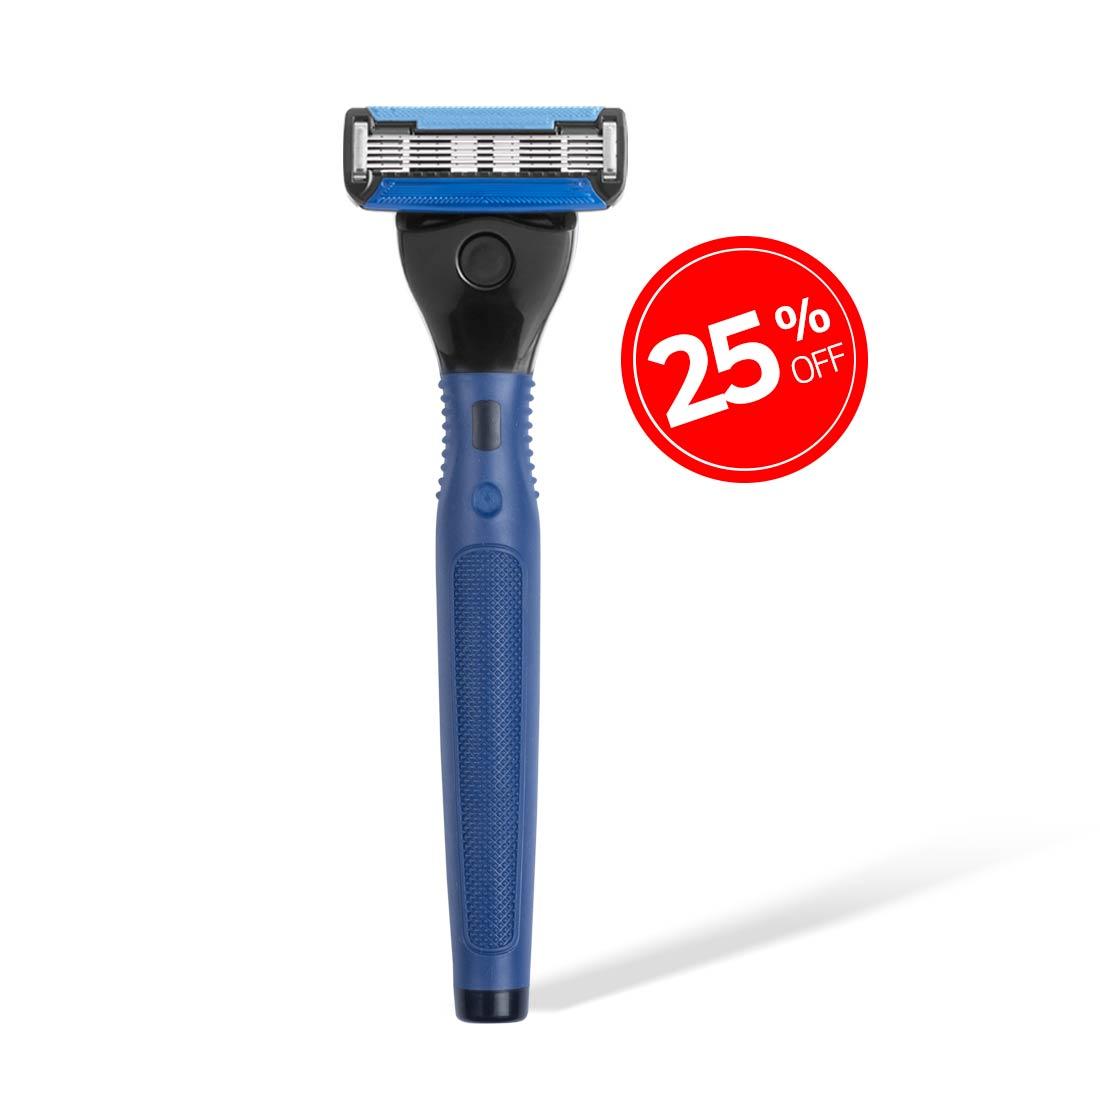 Ustraa 5 Blade Razor - Blue